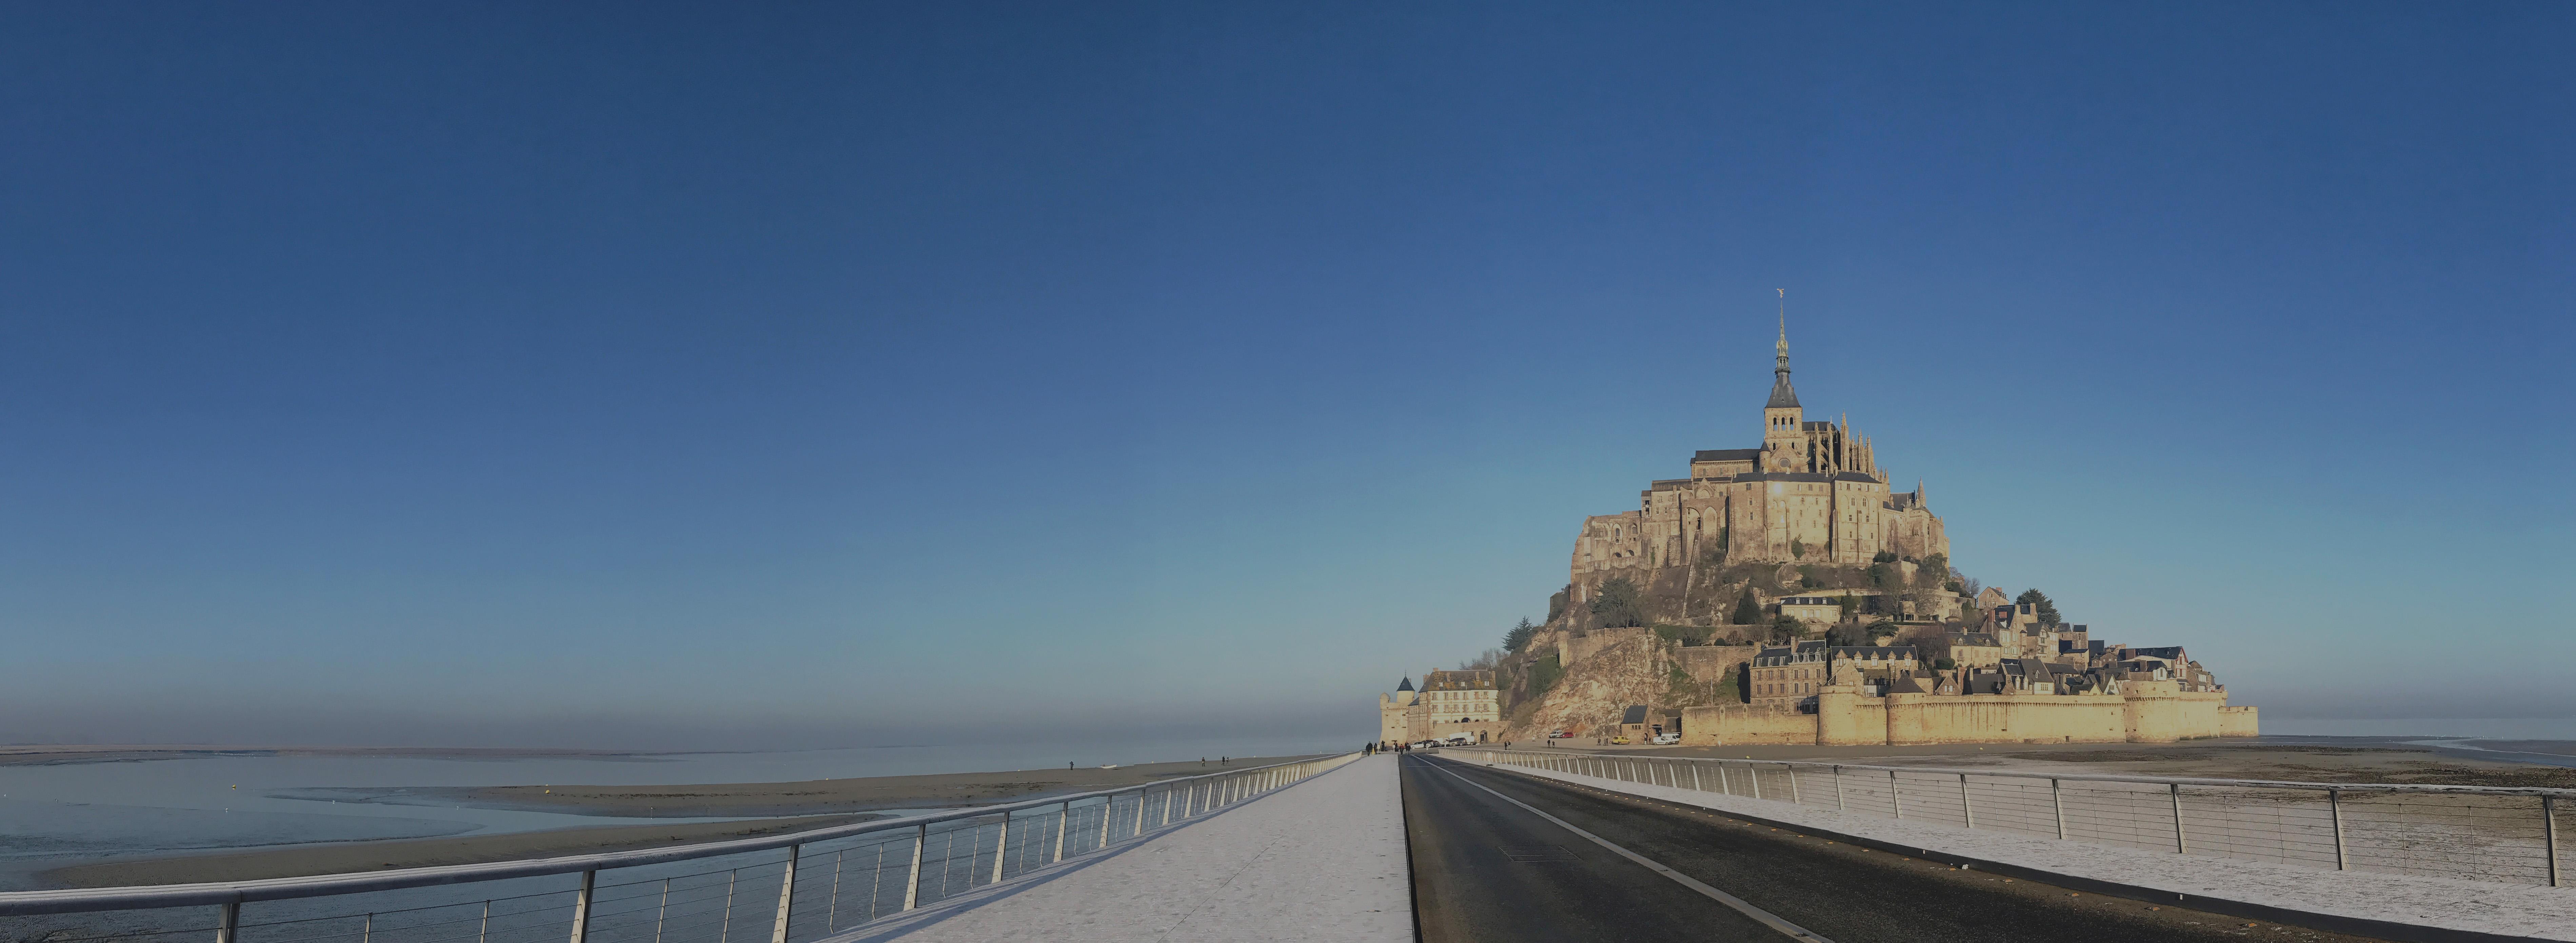 Mont Saint Michel from bay landscape copy.jpg